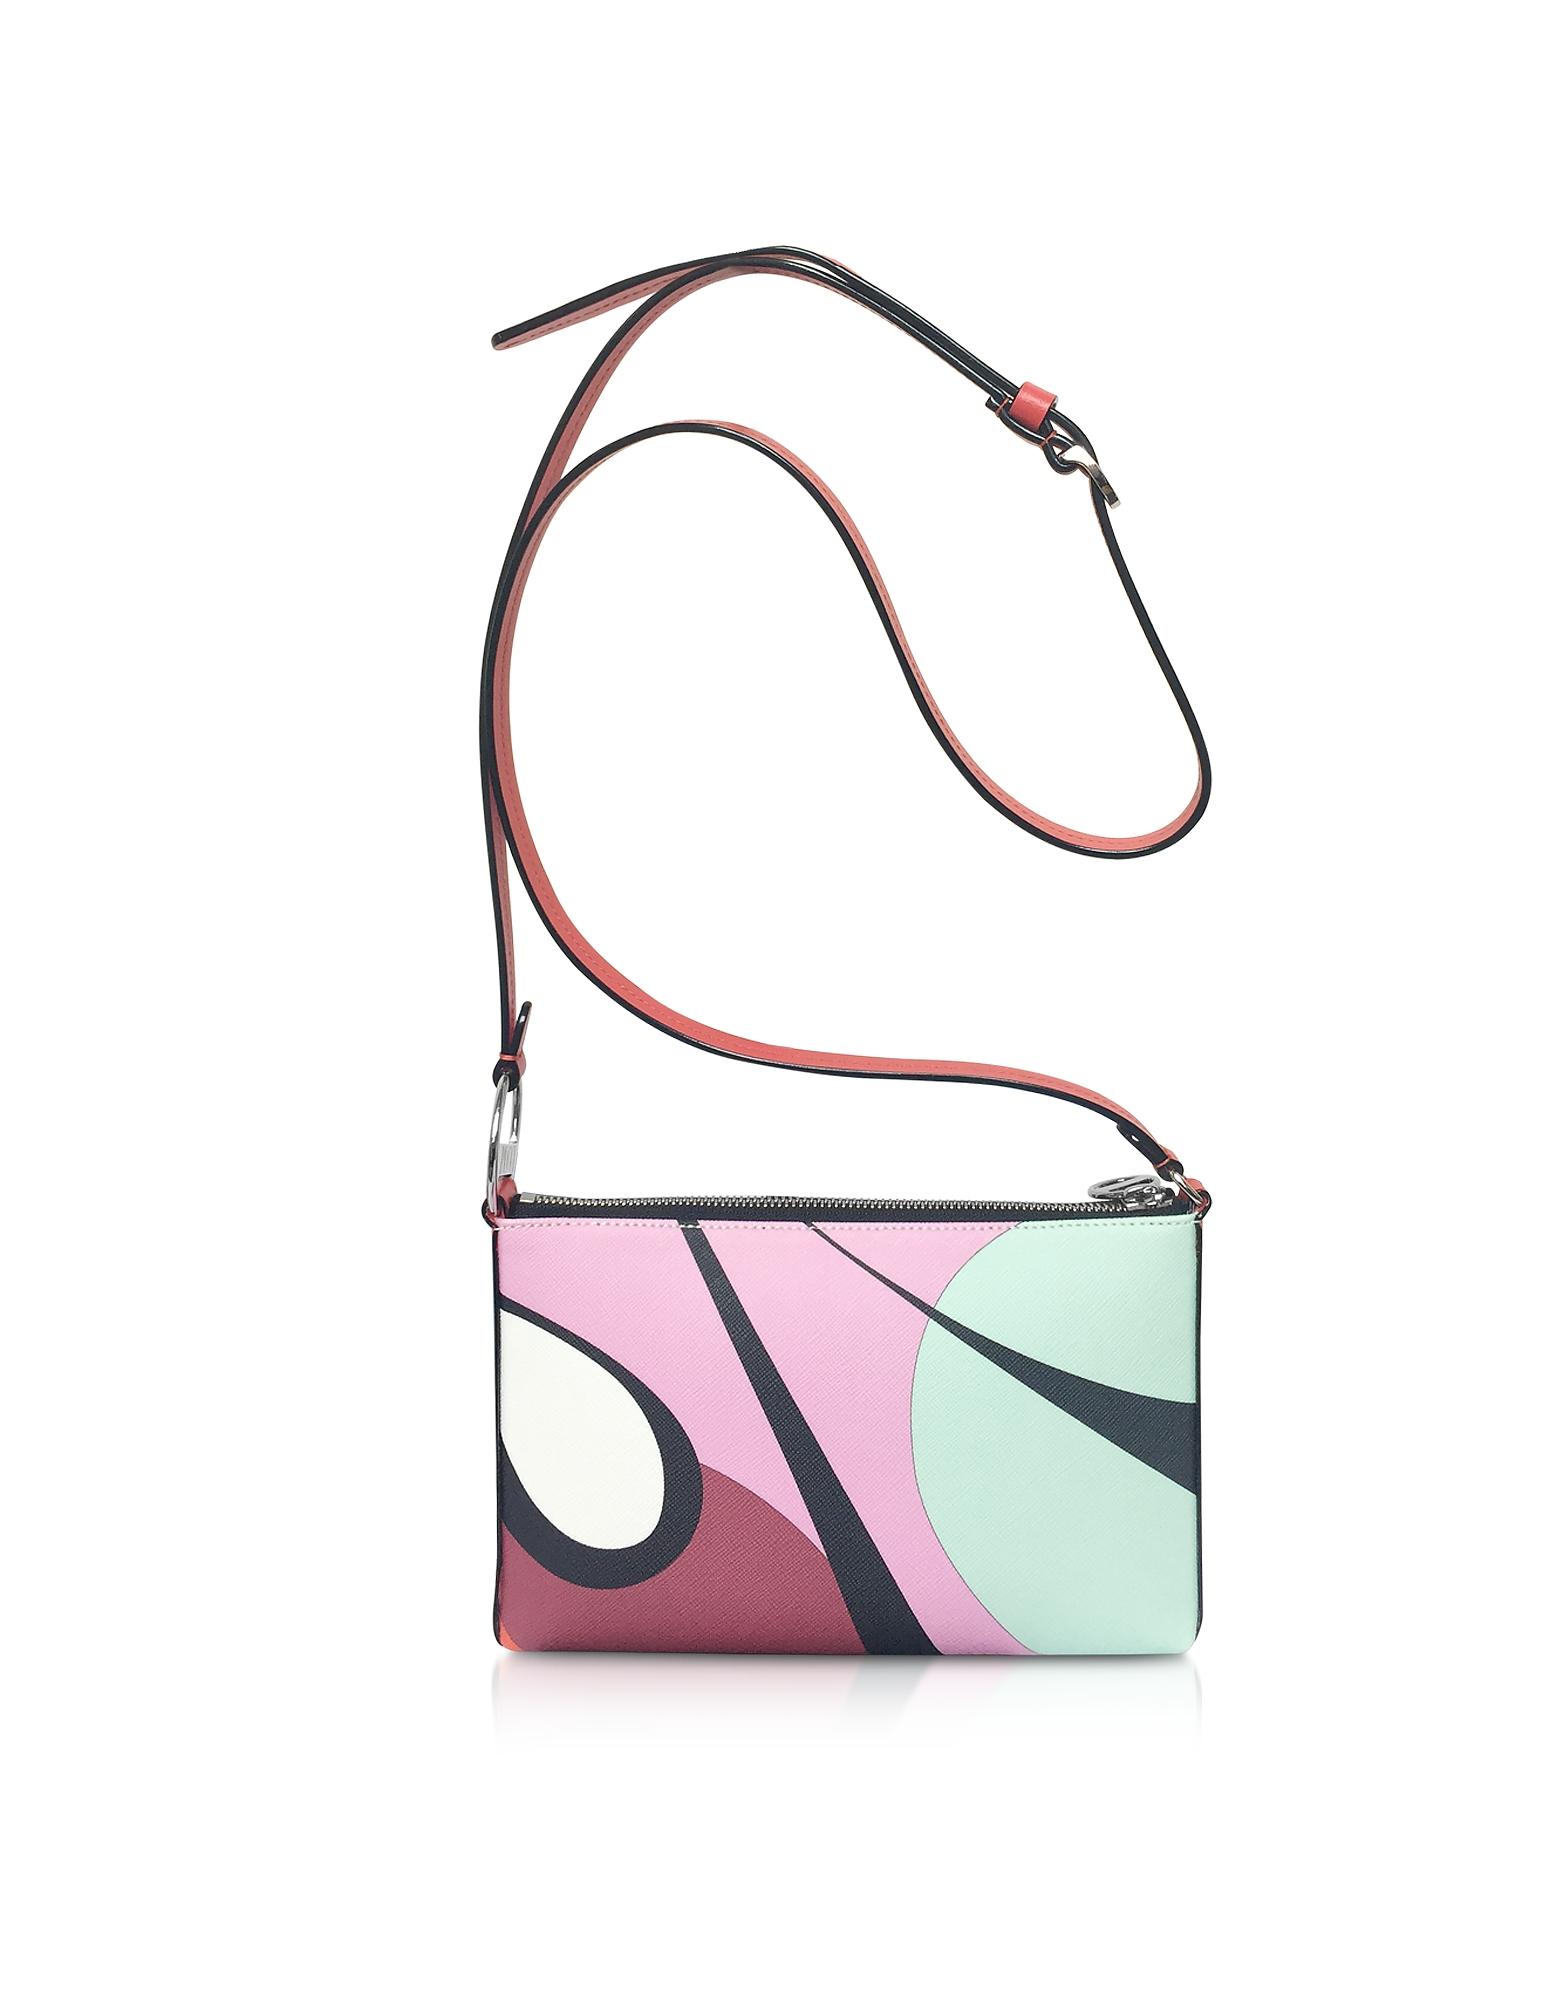 Emilio Pucci Designer Handbags, Alex Print Mini Crossbody Bag